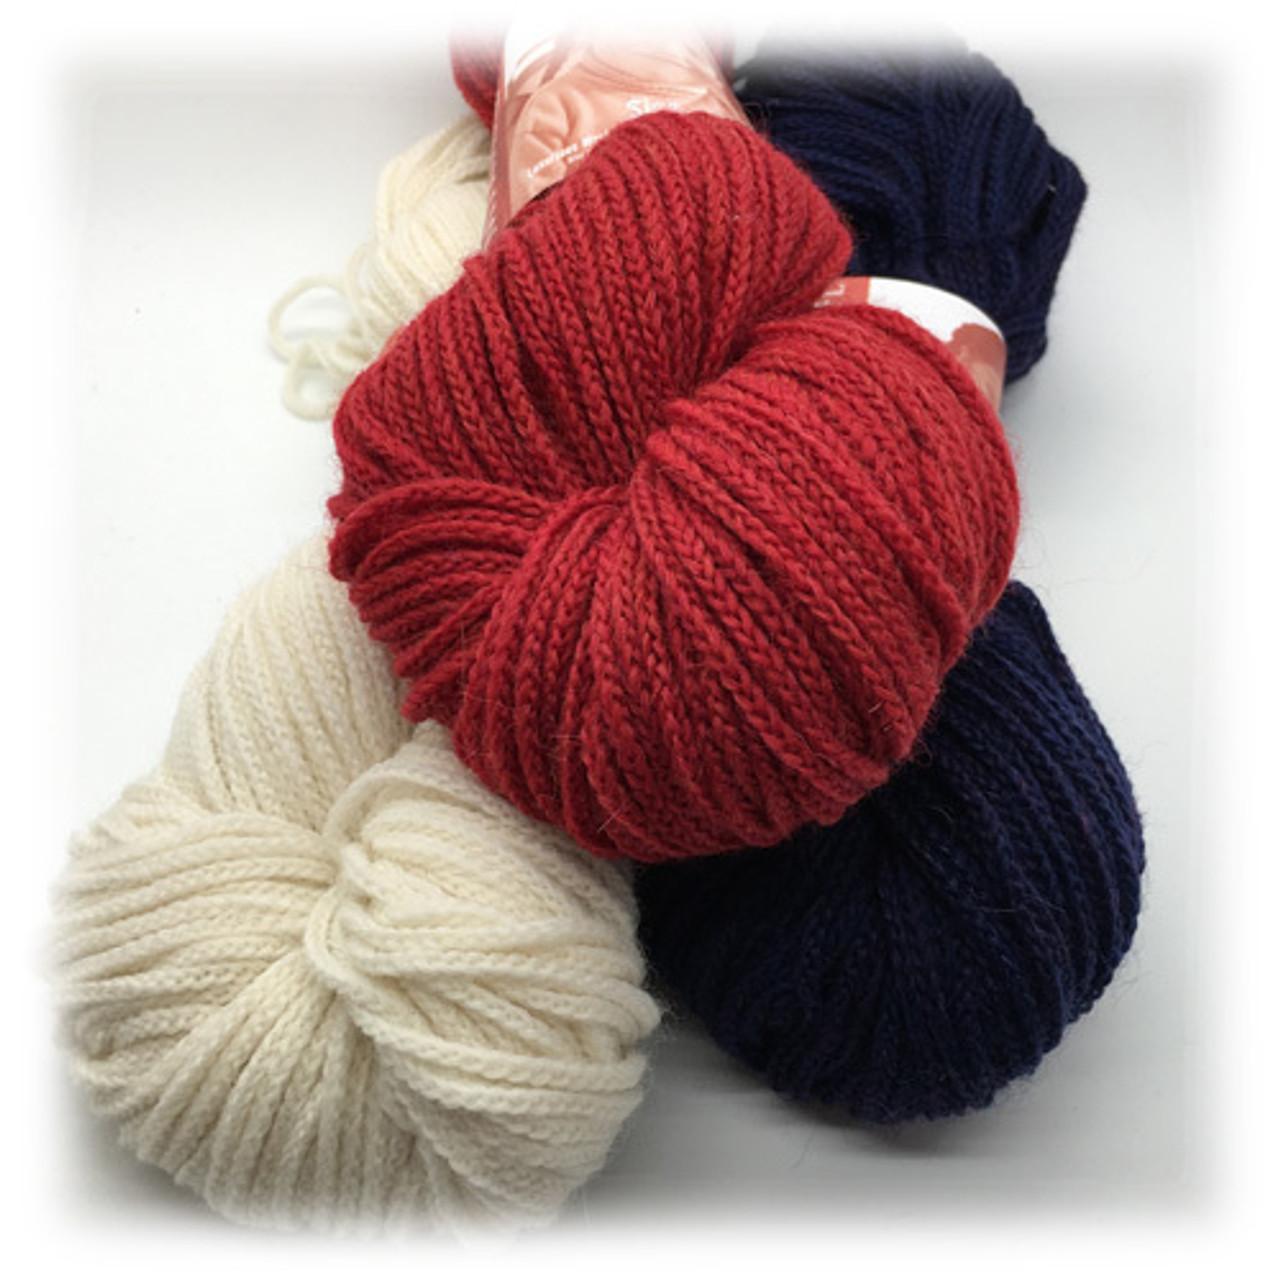 Mirasol Yarn - Sisa